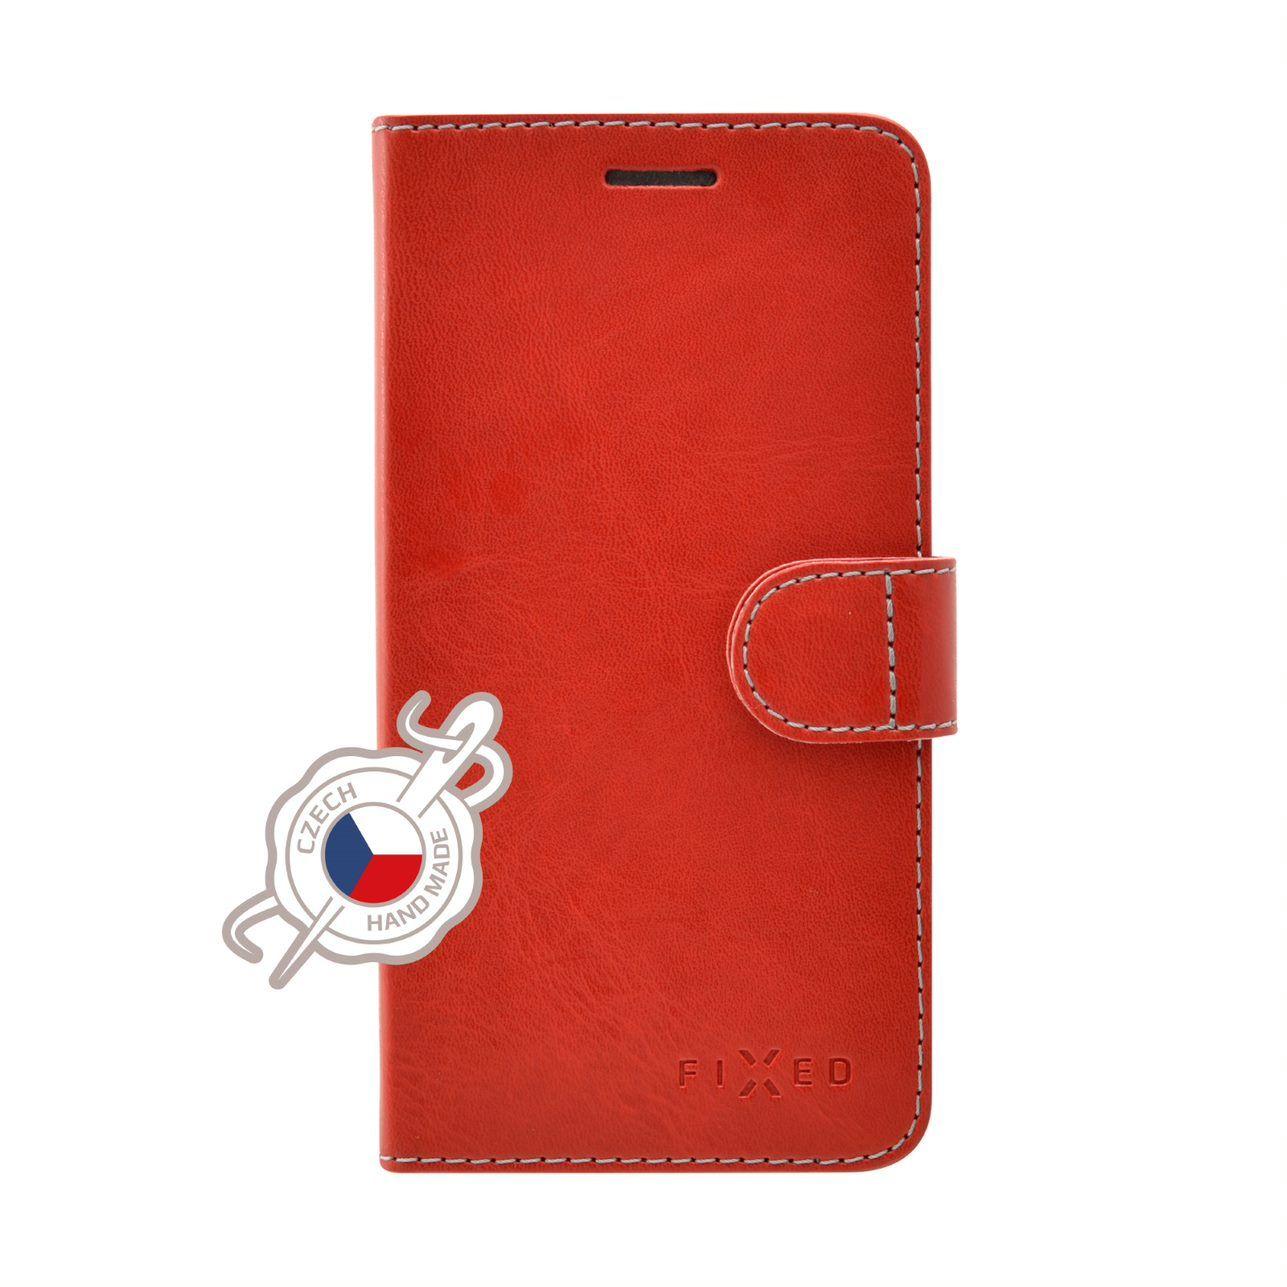 FIXED FIT flipové pouzdro pro Huawei Nova 3i, červené